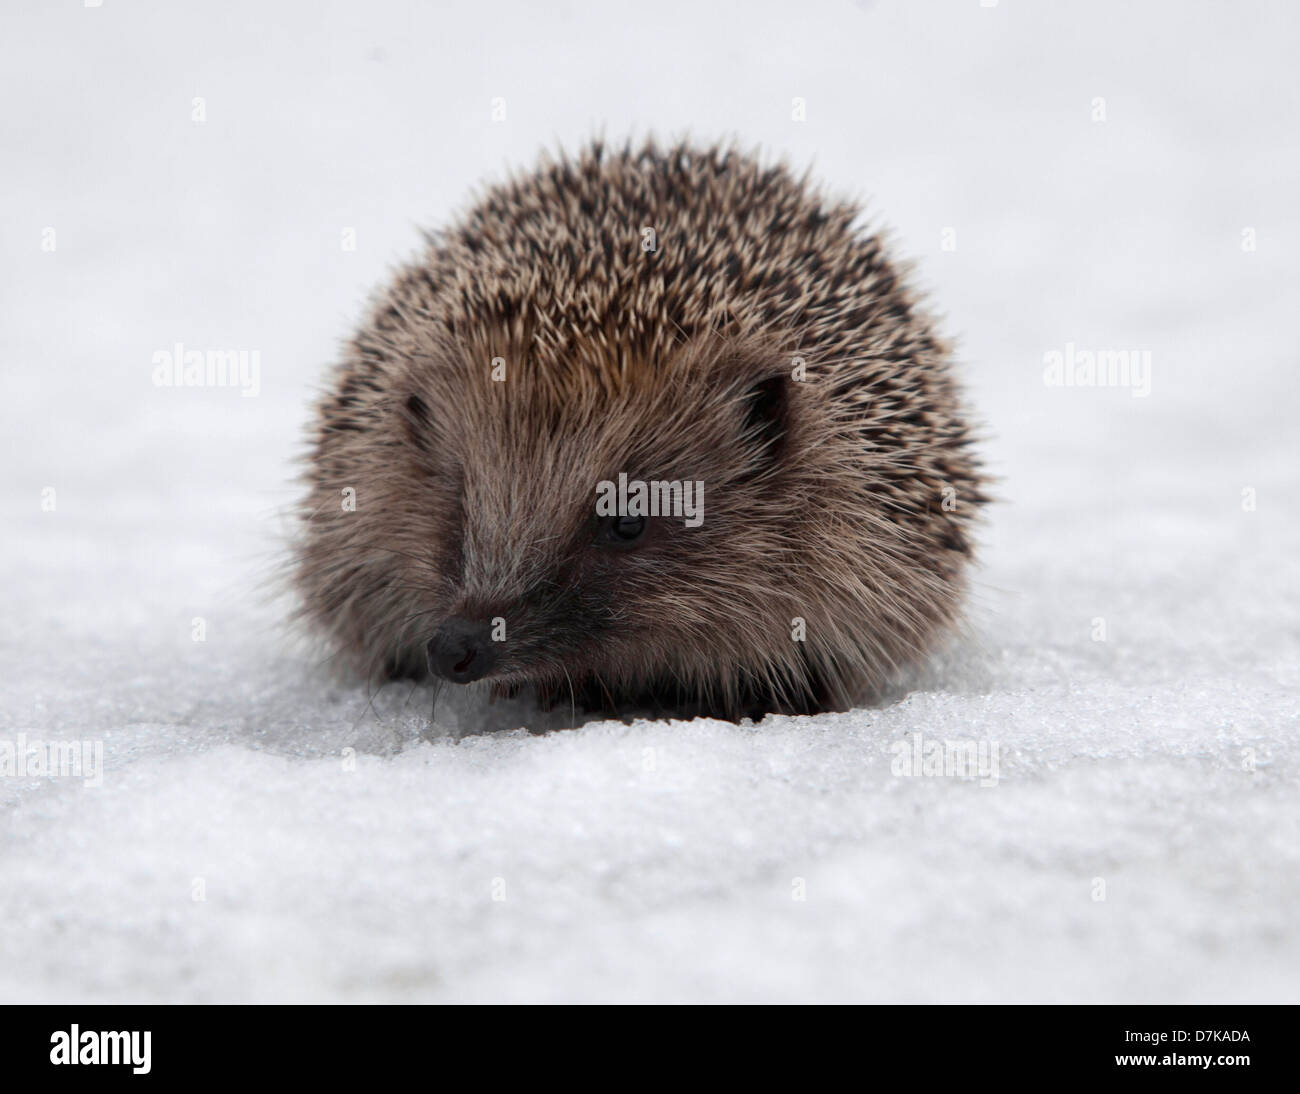 European Hedgehog in snow - Stock Image